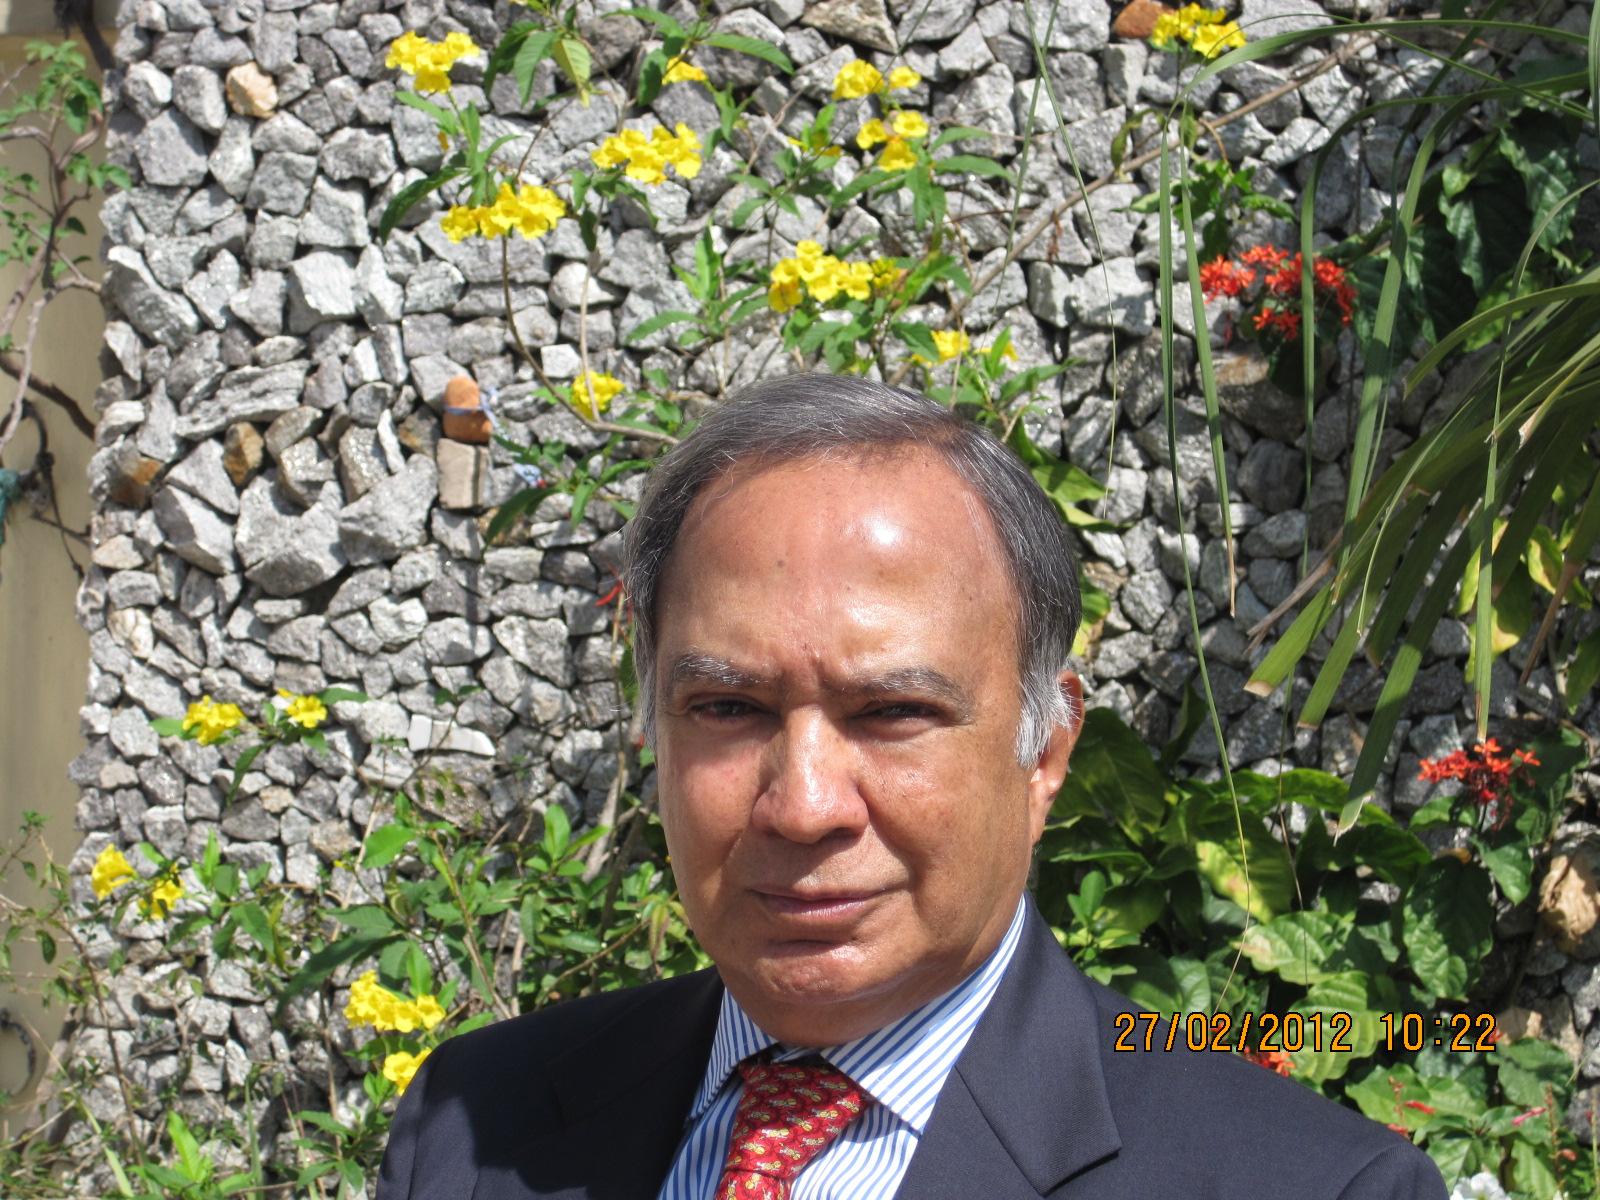 Krishnan Srinivasan. Credit: Wikimedia Commons